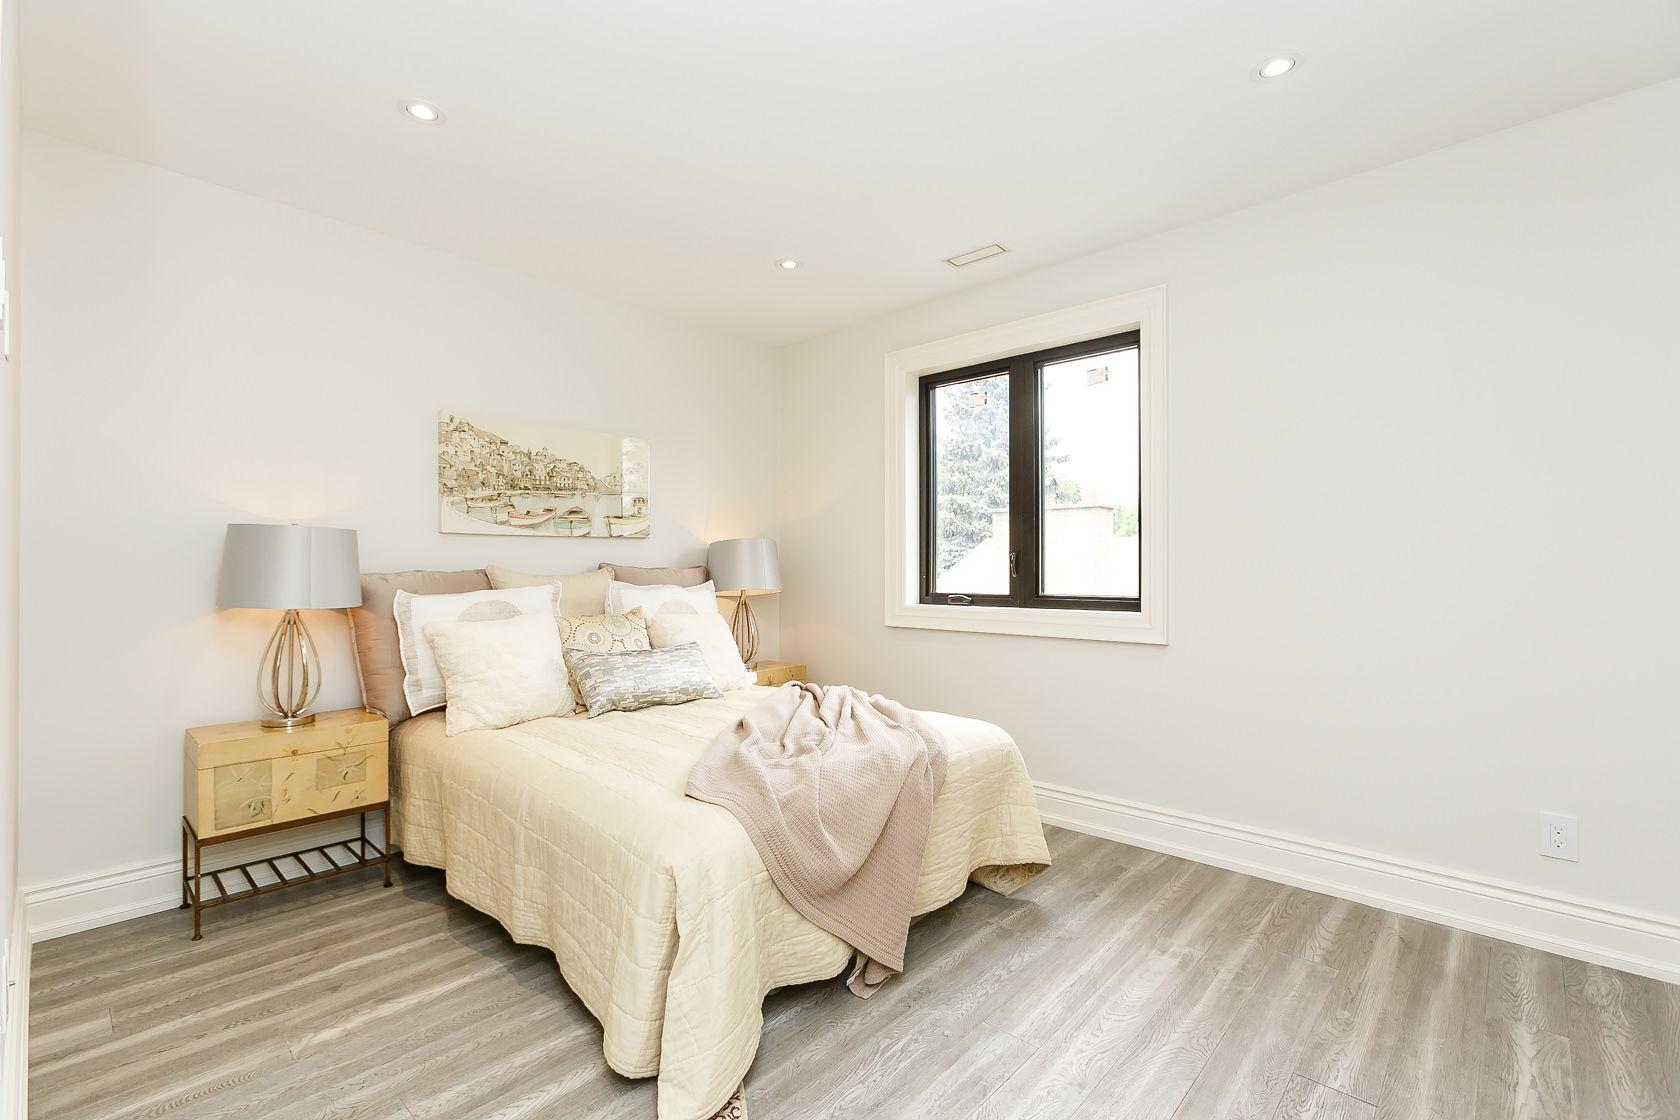 Third Bedroom Window, 49 Rossburn, Etobicoke Home Staging